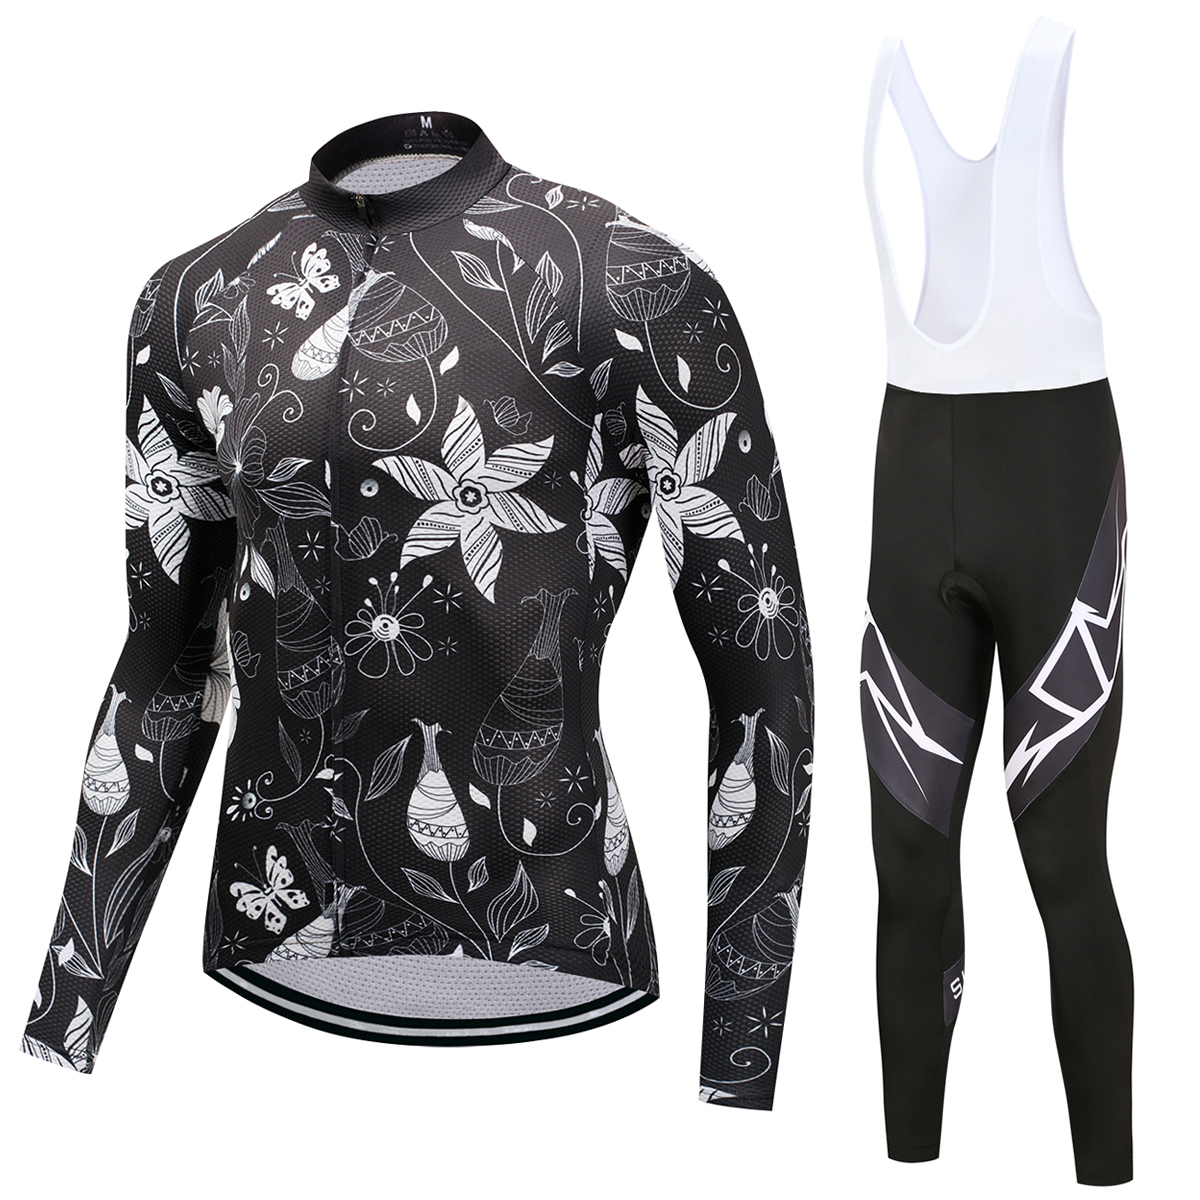 SUSHAN 2018 Pro Flier Winter Thermische Fleece Radtrikot Set Long Sleeve Fahrrad Kleidung MTB Bike Wear Maillot Ropa Ciclismo